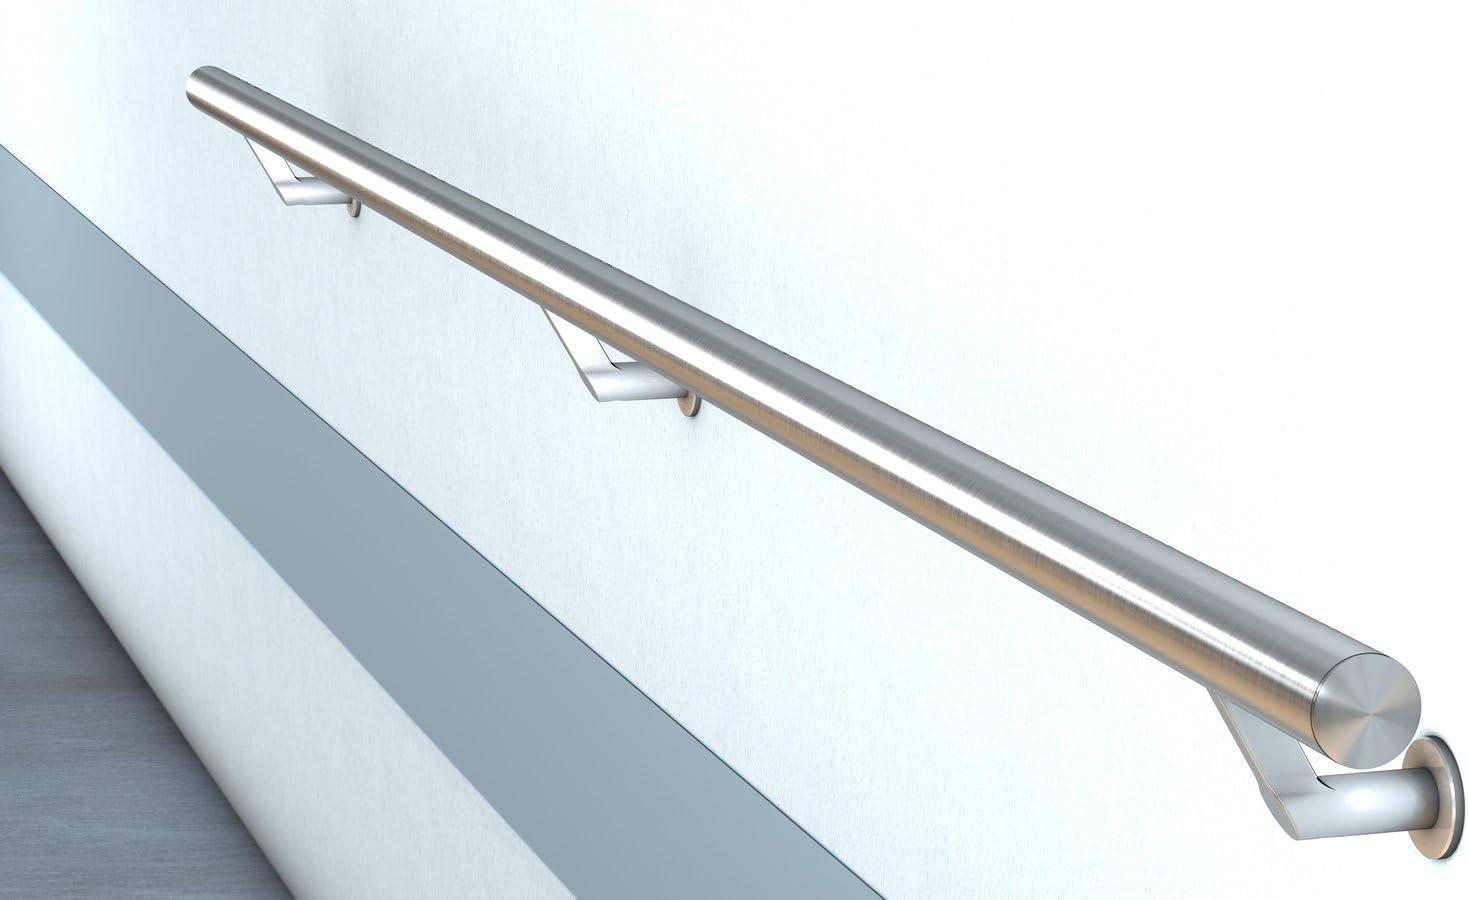 2,3 m - einteilig Edelstahl Handlauf V2A Fertighandlauf Gel/änder Treppe Griff /Ø42,4x2 mit diagonale Tr/äger